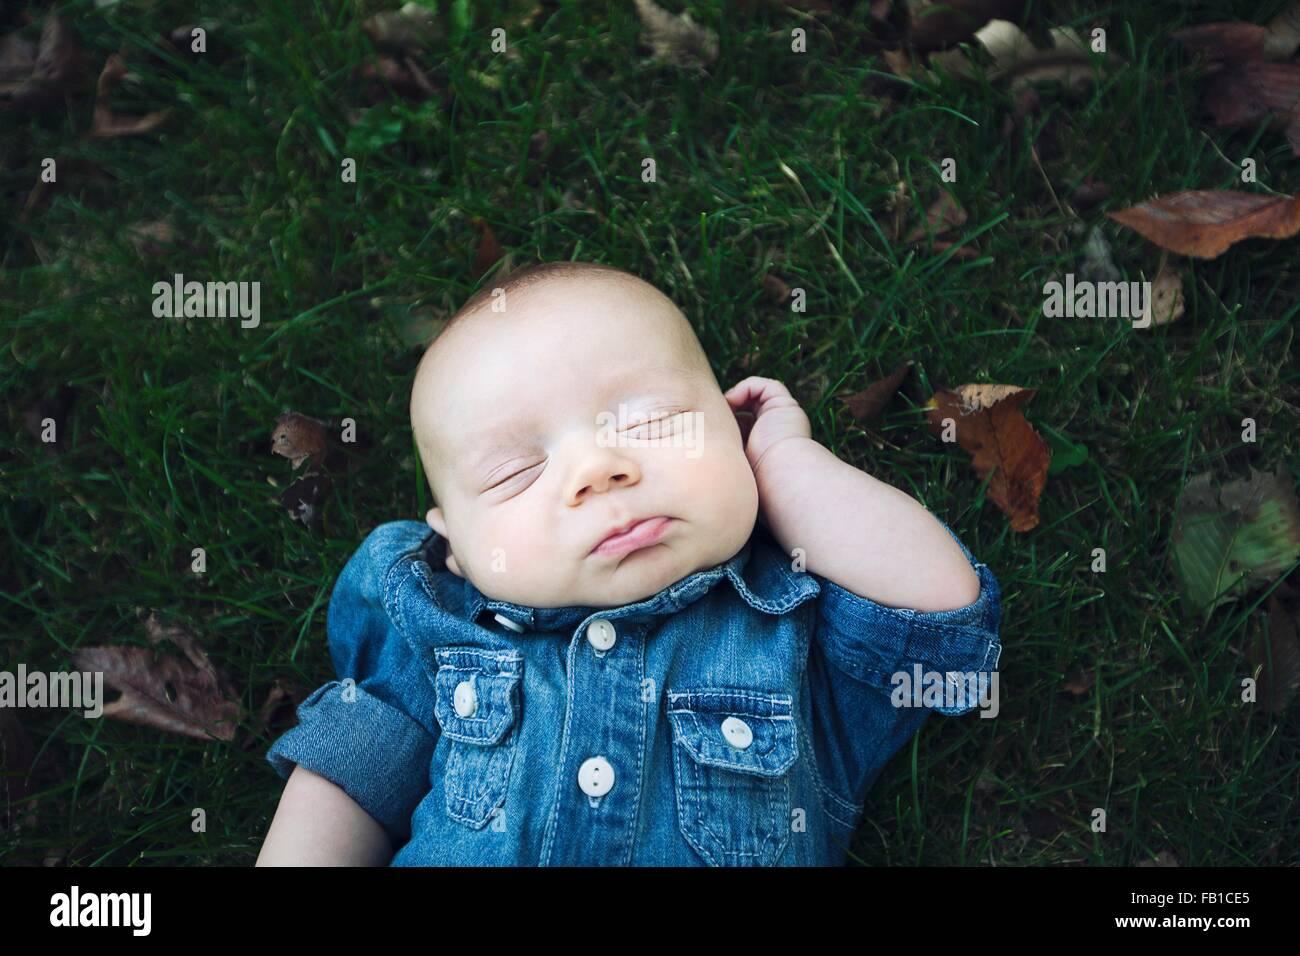 Baby boy wearing denim shirt lying on autumn leaf covered grass eyes closed - Stock Image